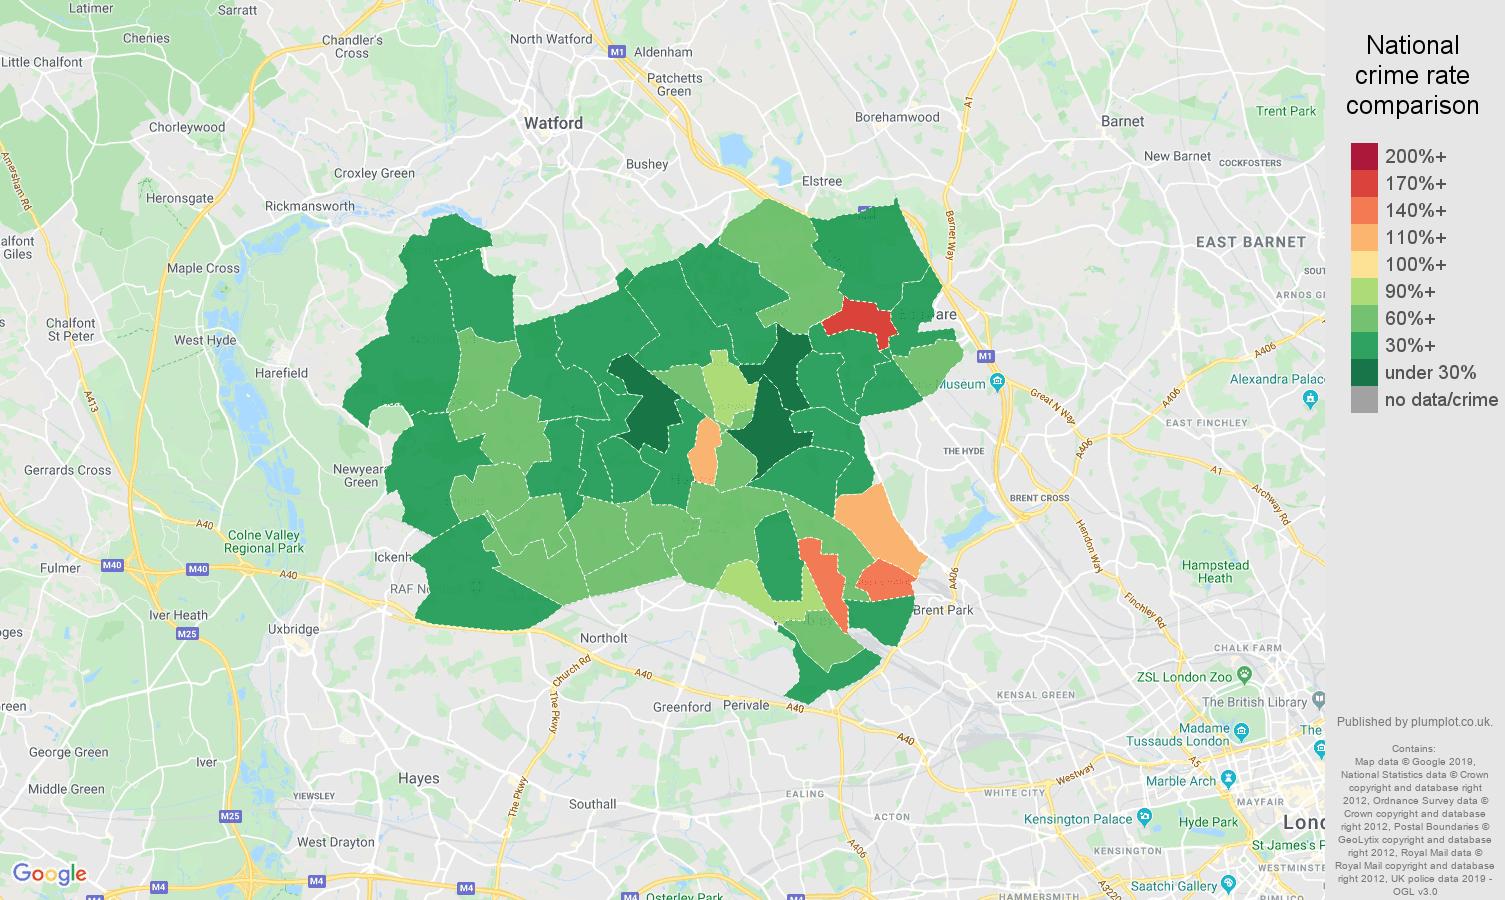 Harrow public order crime rate comparison map